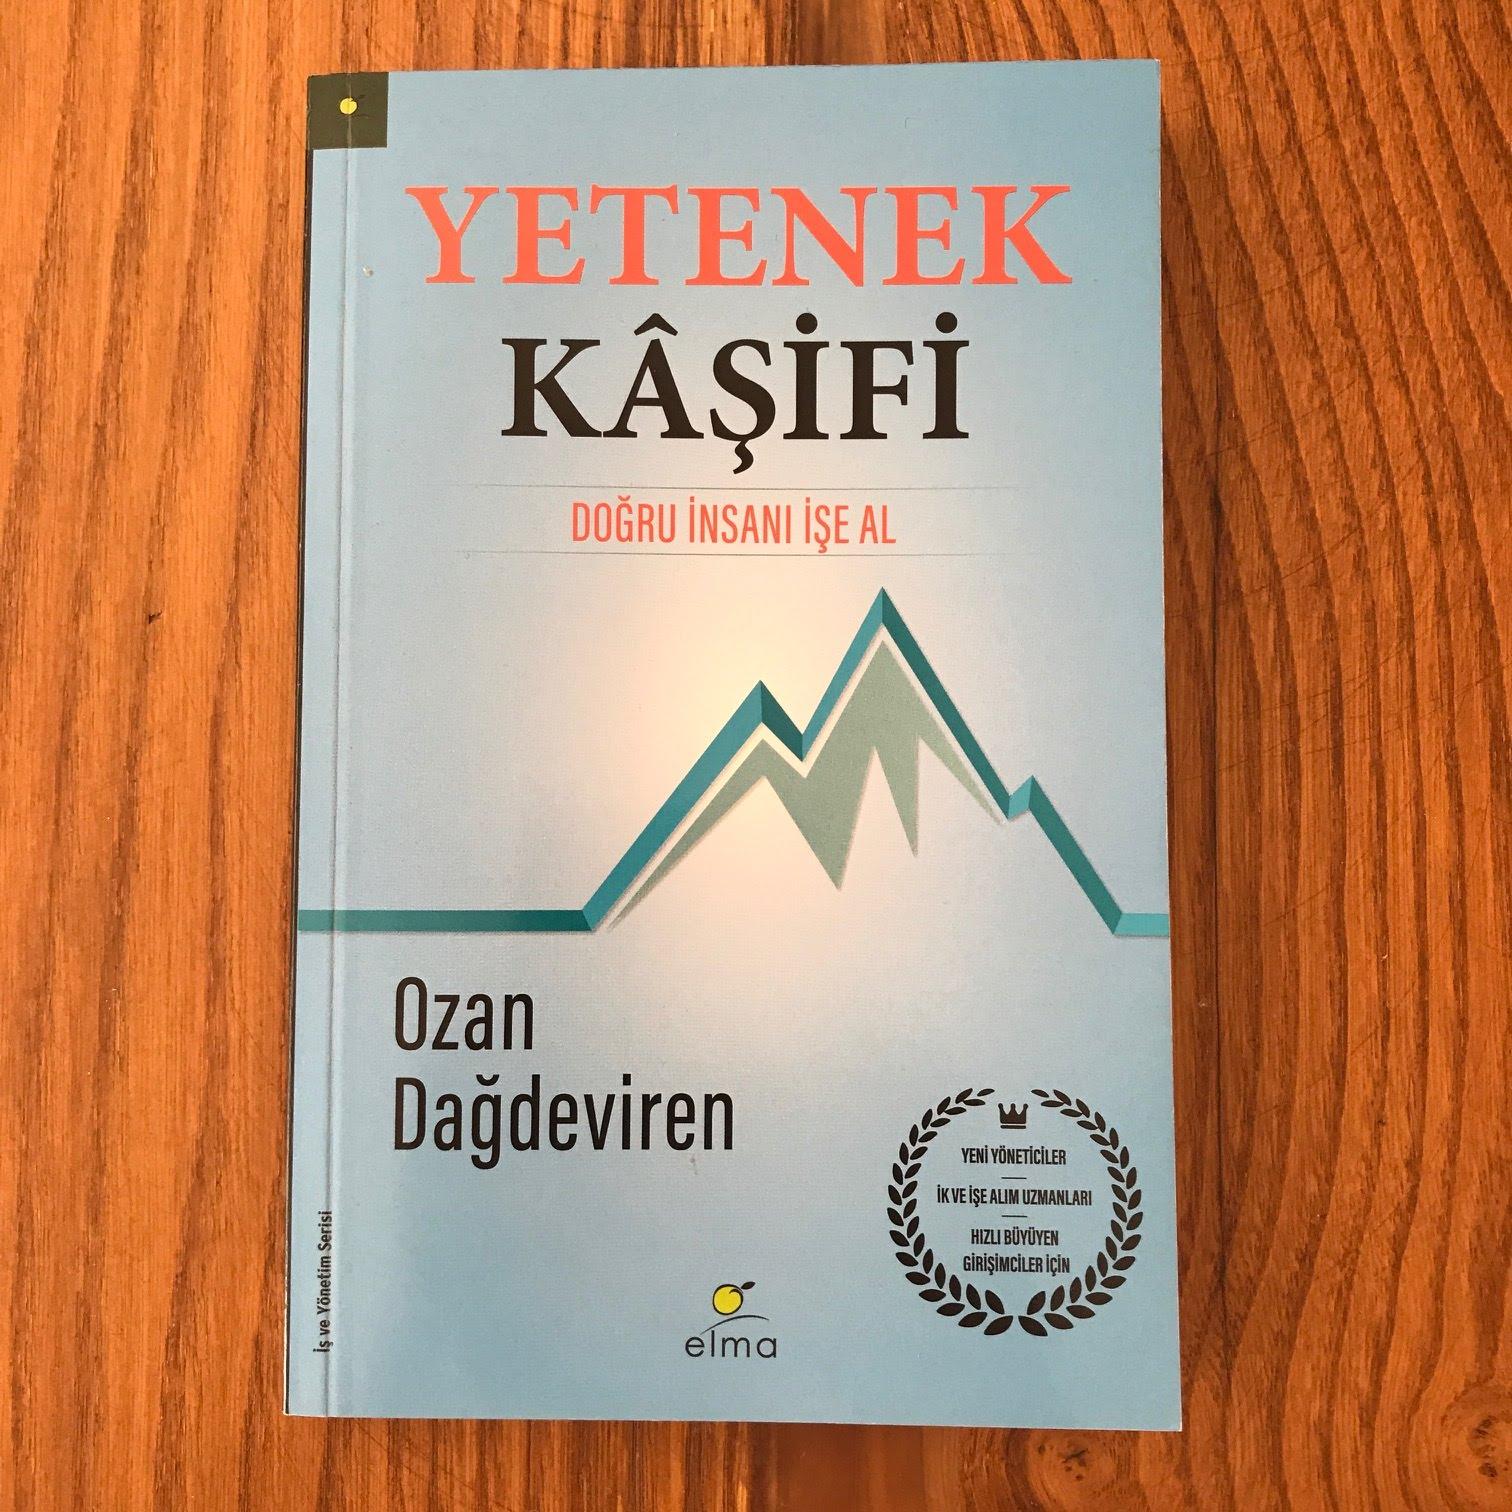 Yetenek Kasifi - Dogru Insani Ise Al (Kitap)